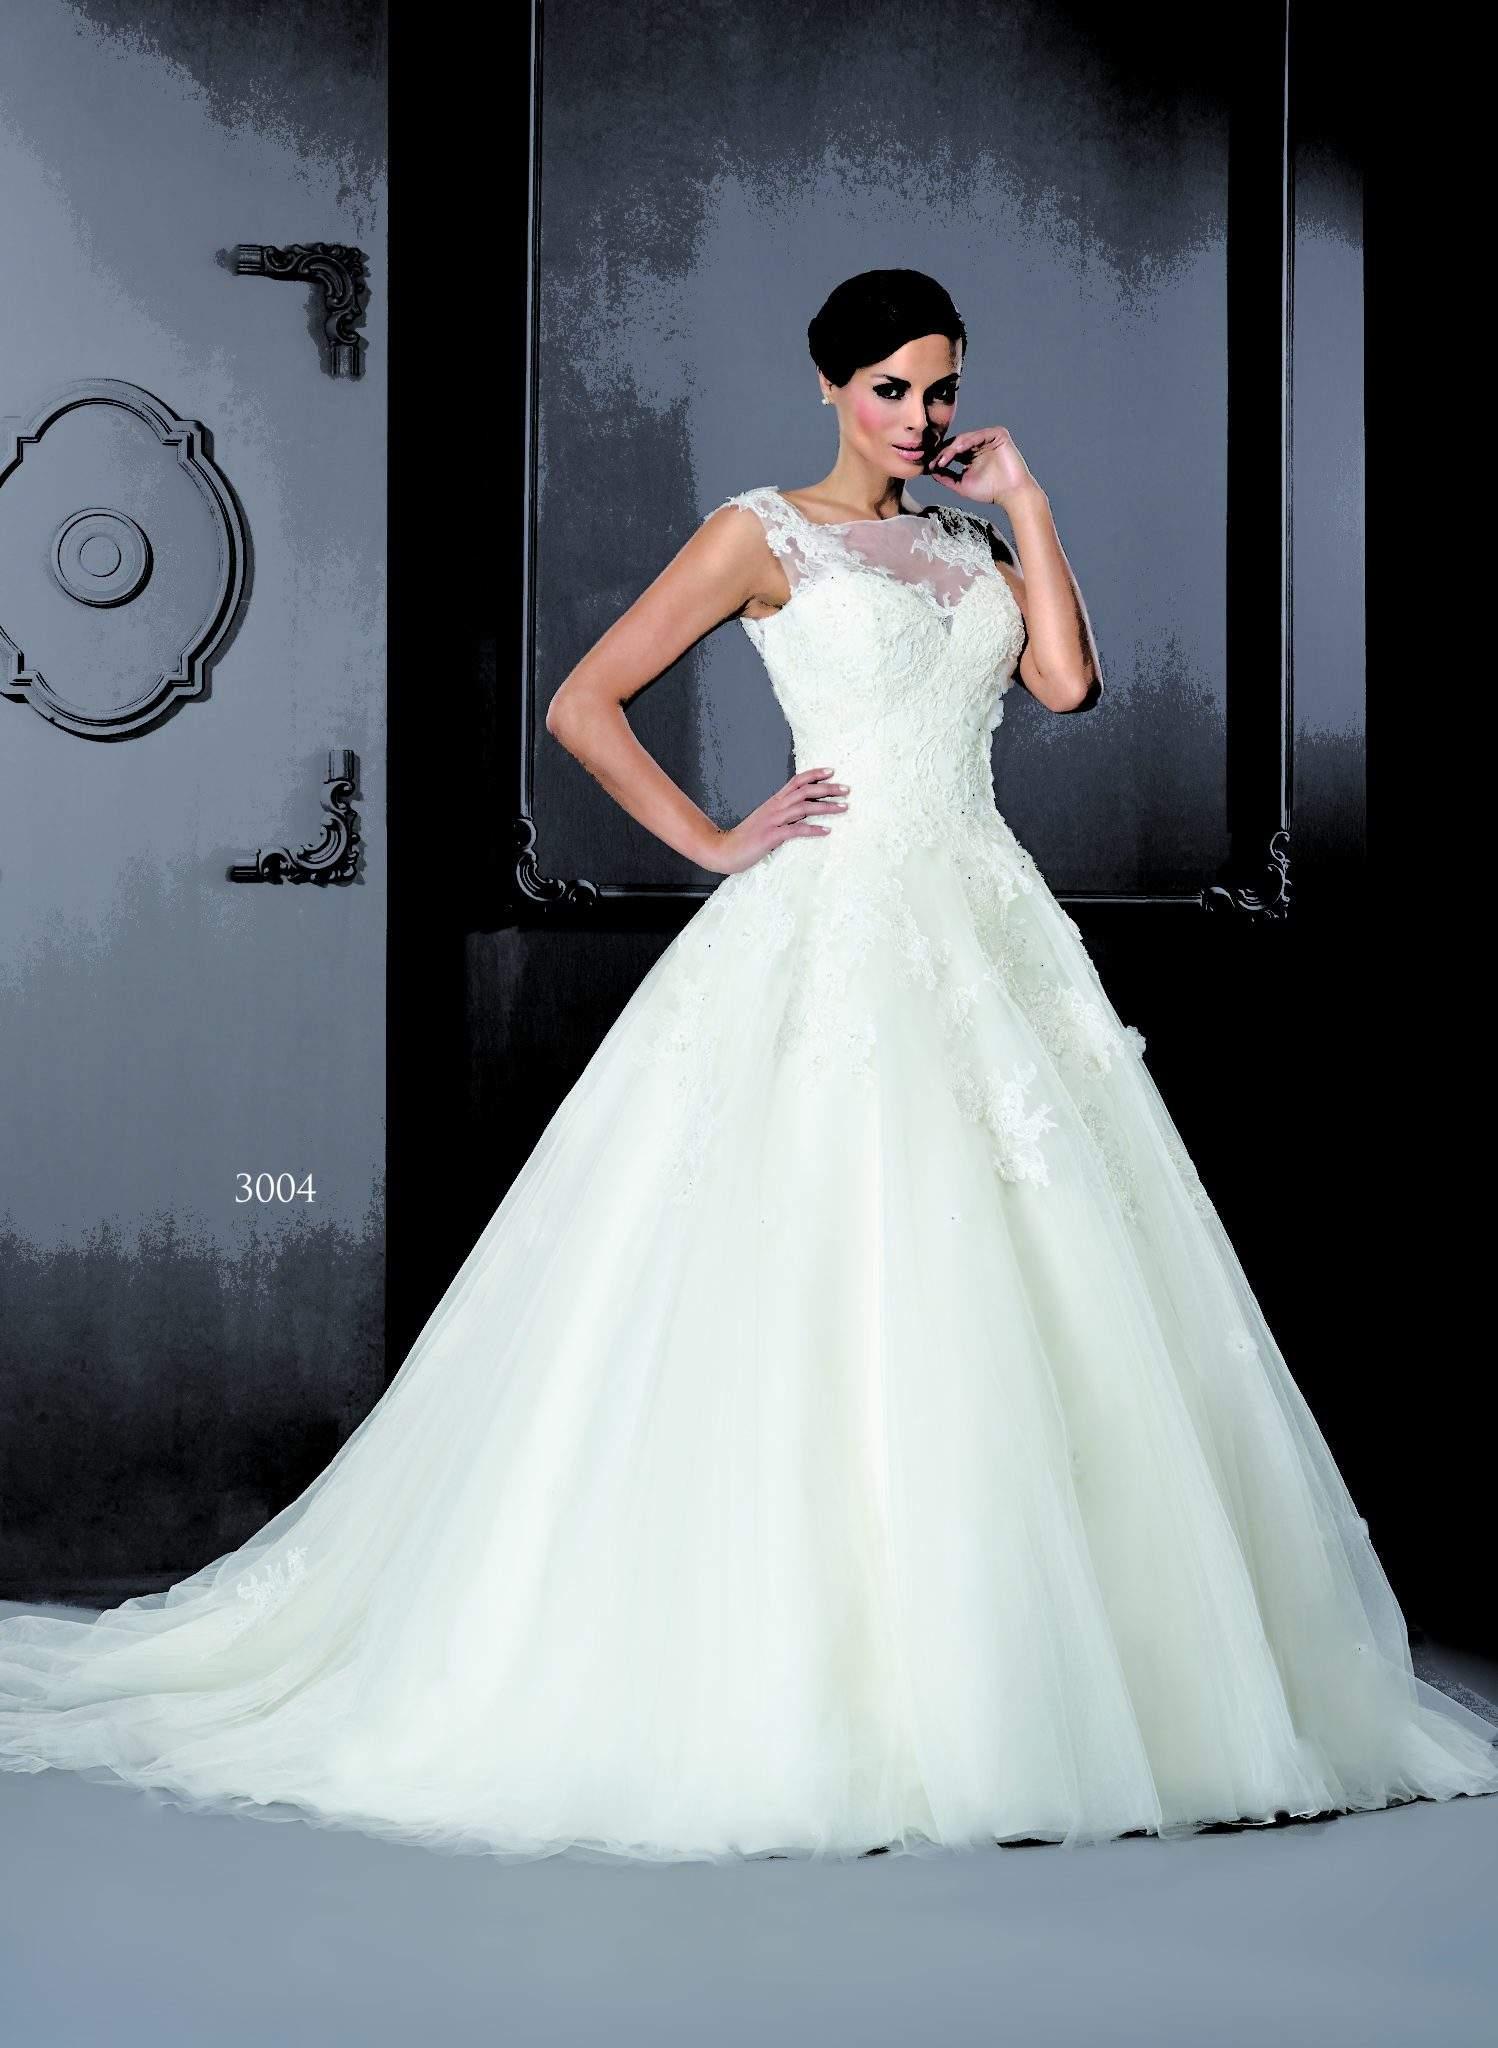 e1561311e93c Modest Lace Wedding Dress - PostParc